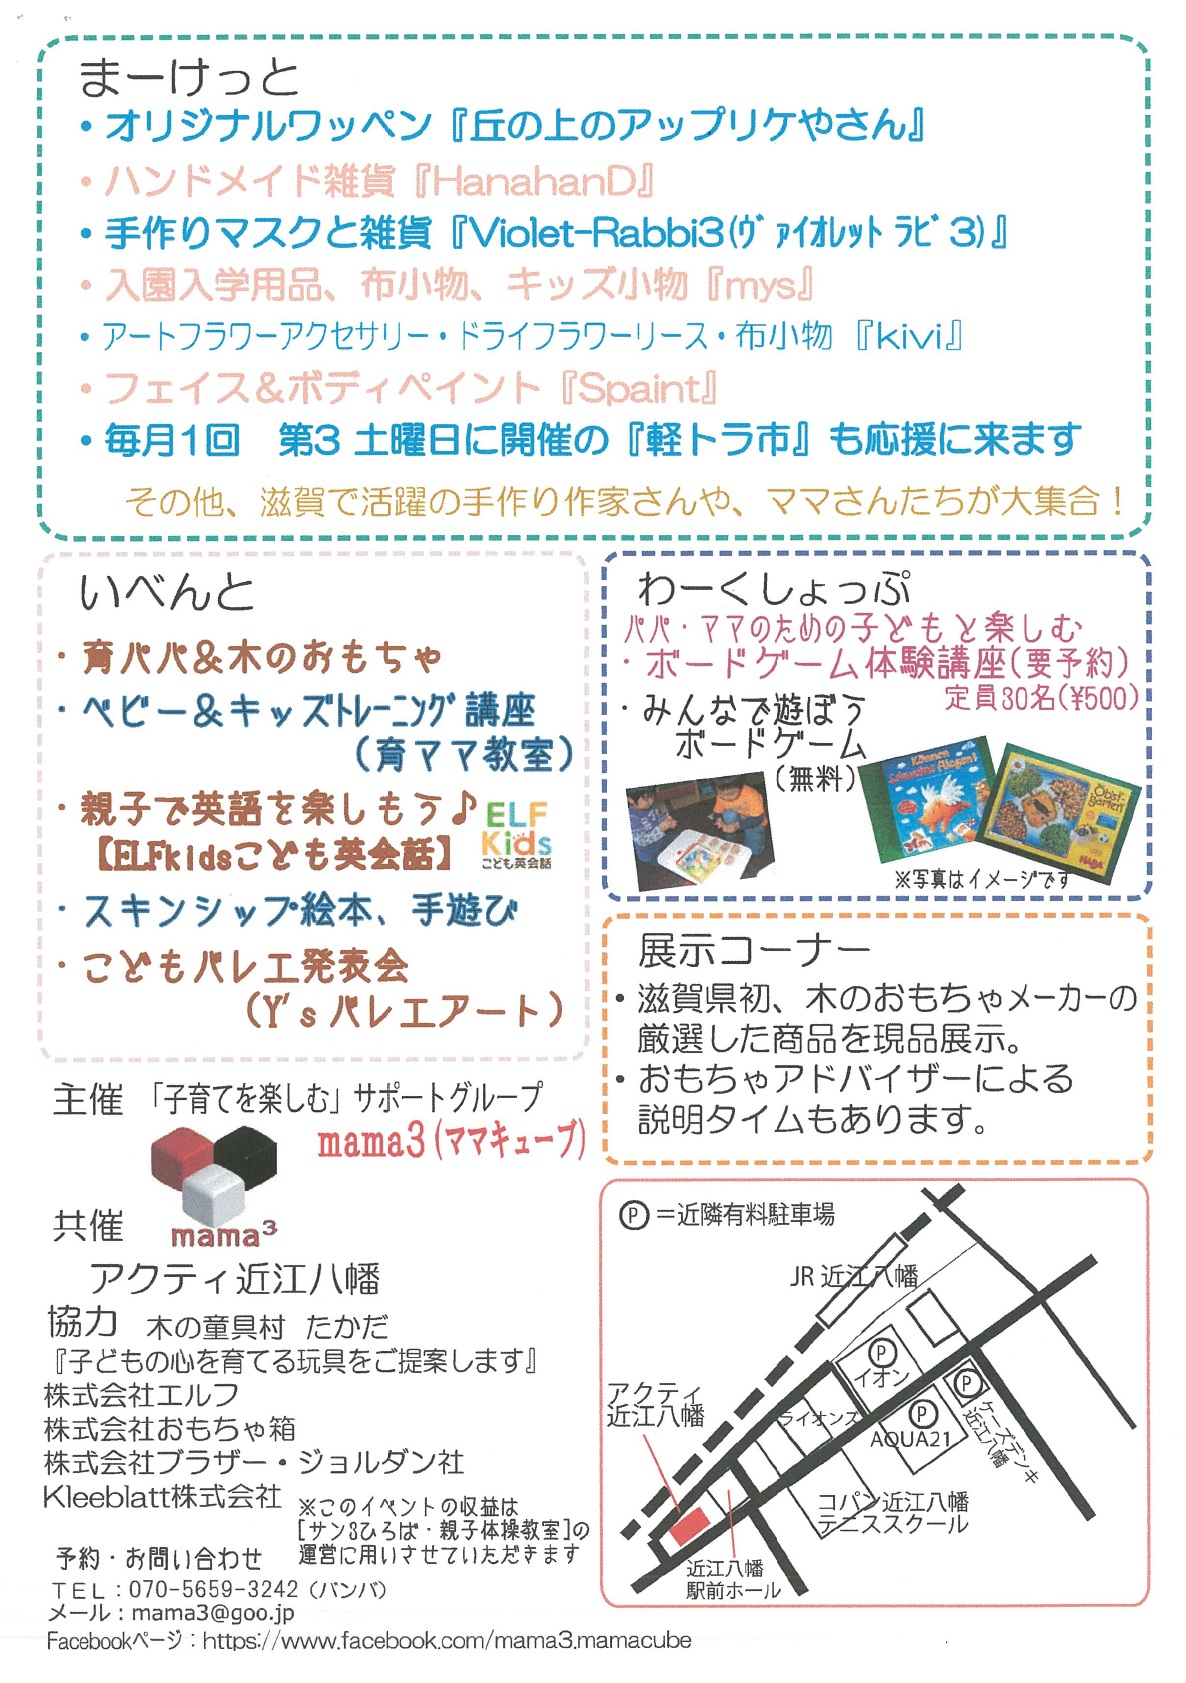 http://good-living.jp/staff-blog/pic/%E3%81%A4%E3%81%AA%E3%81%8C%E3%82%8B%E3%83%9E%E3%83%BC%E3%82%B1%E3%83%83%E3%83%88%E2%91%A1.jpg